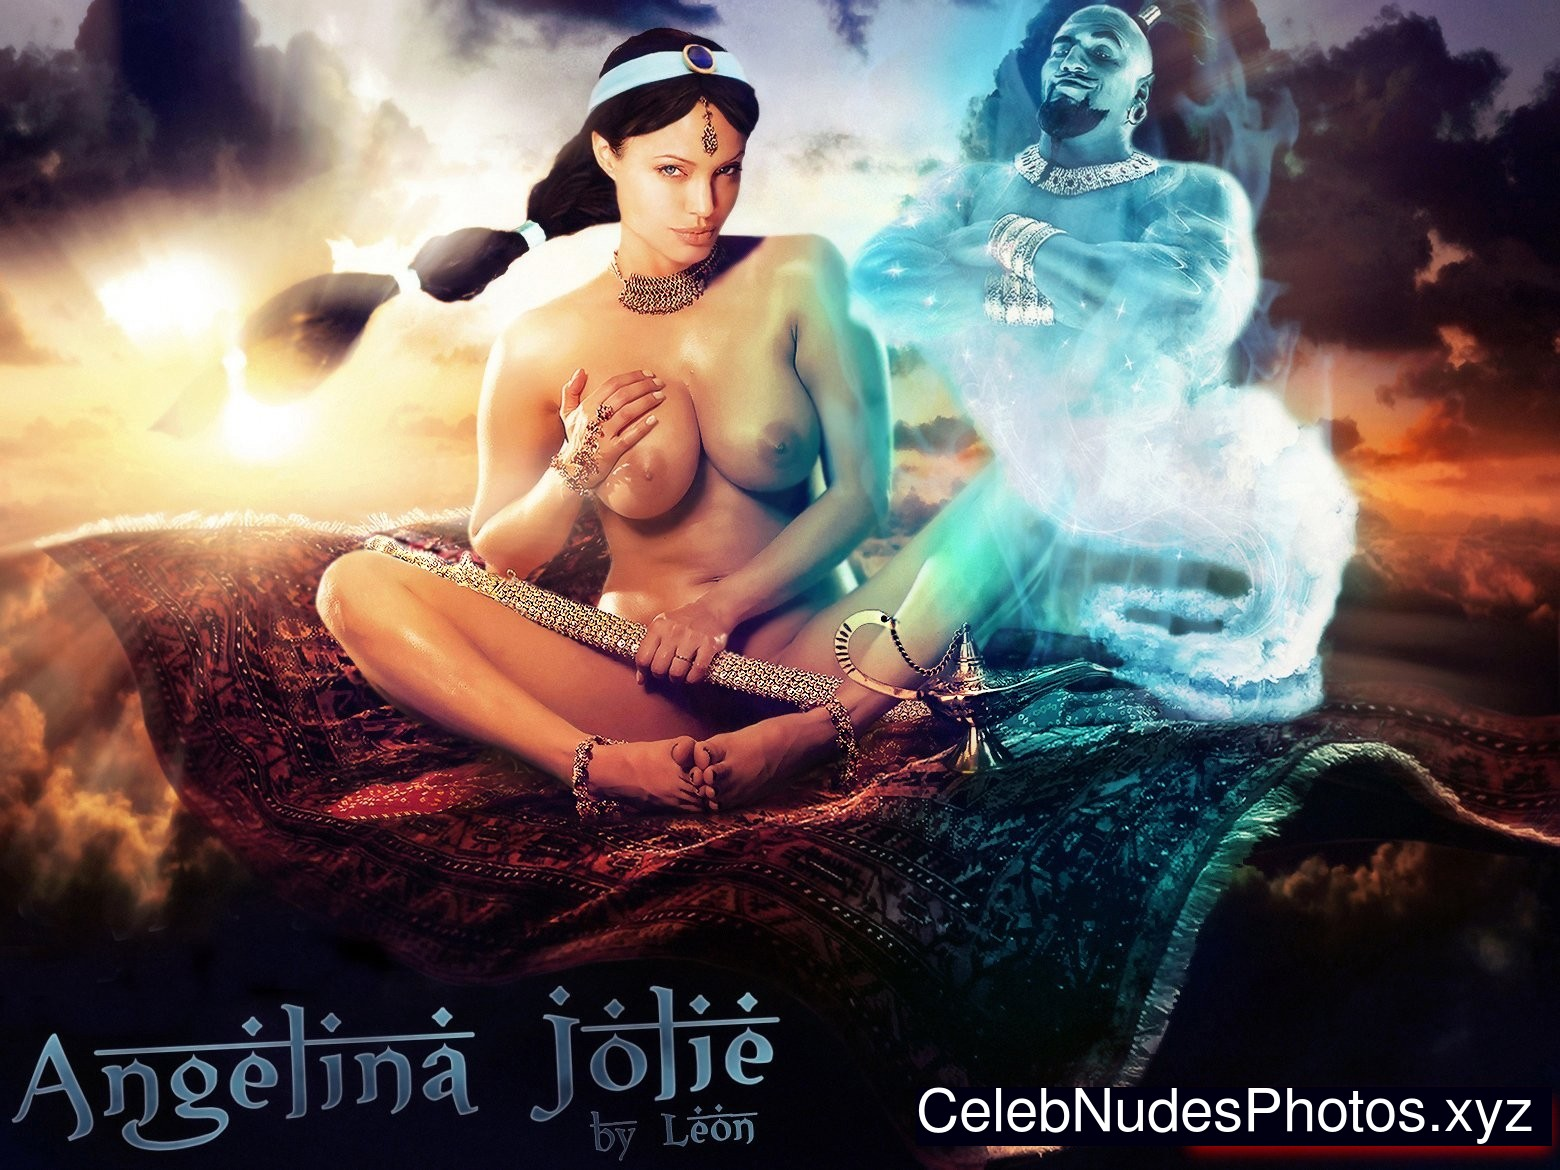 Angelina Jolie celebrity nude pics